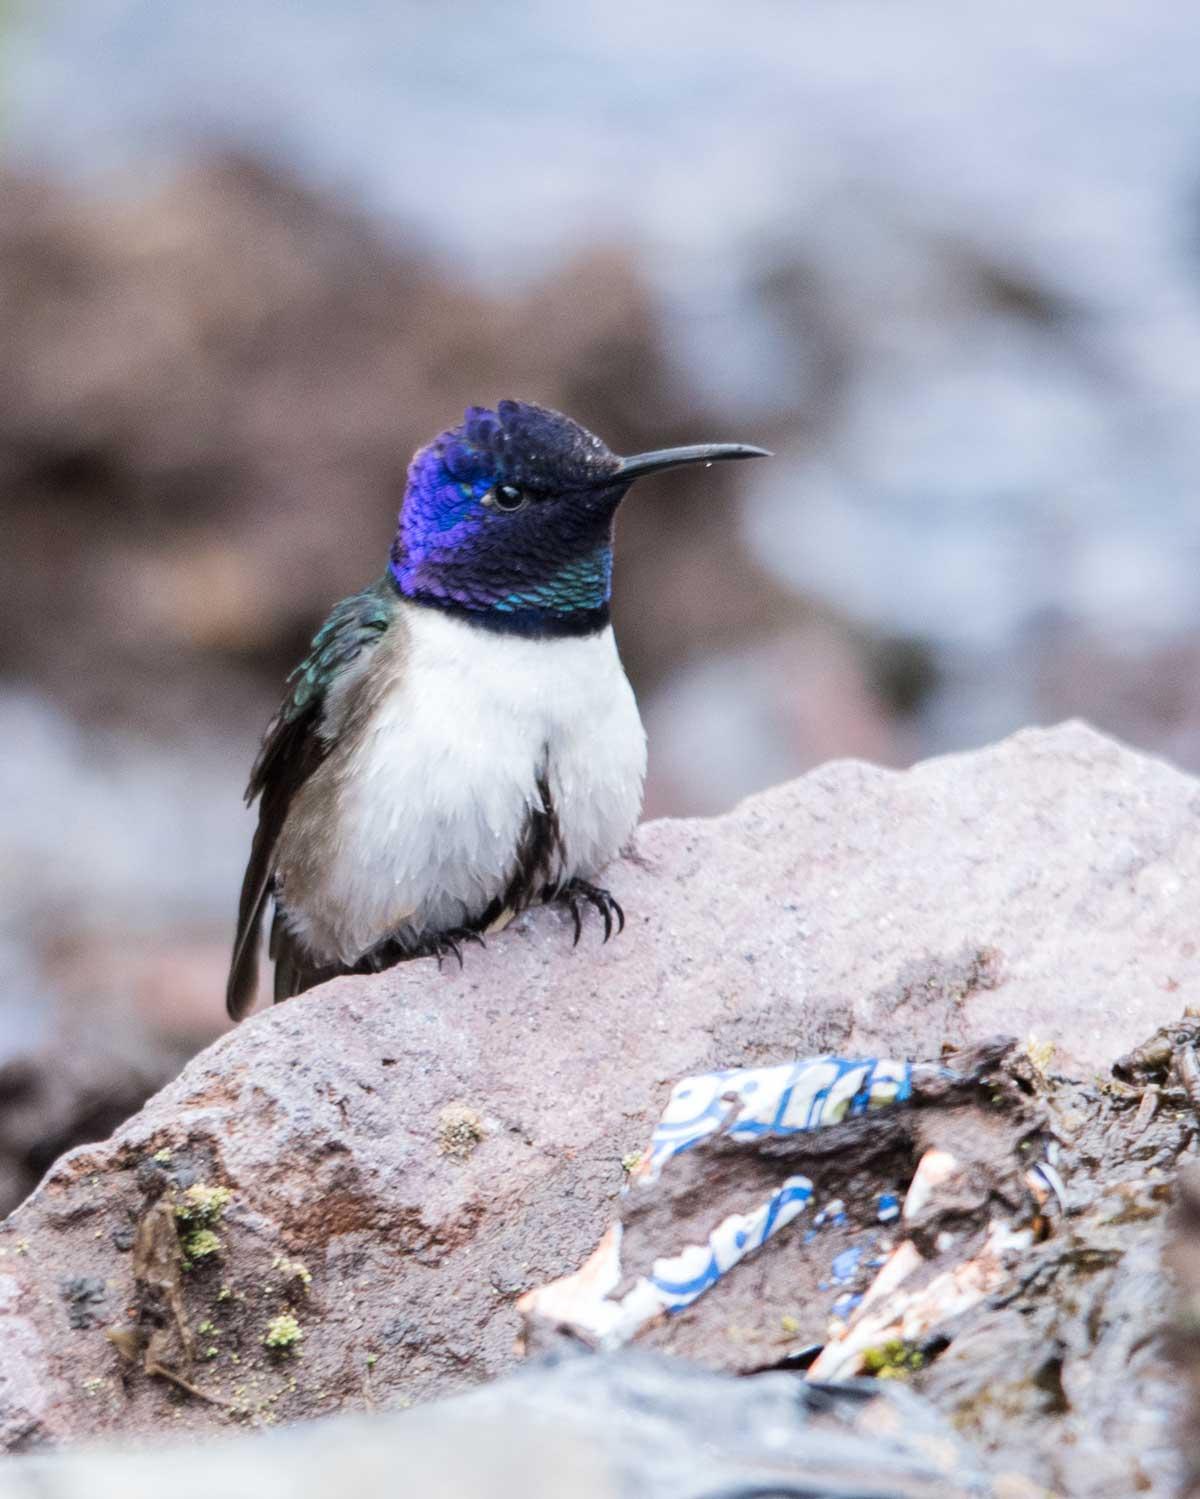 The Ecuadorian Hillstar, Chimborazo variation; Chimborazo Wildlife Reserve, Ecuador | ©Angela Drake